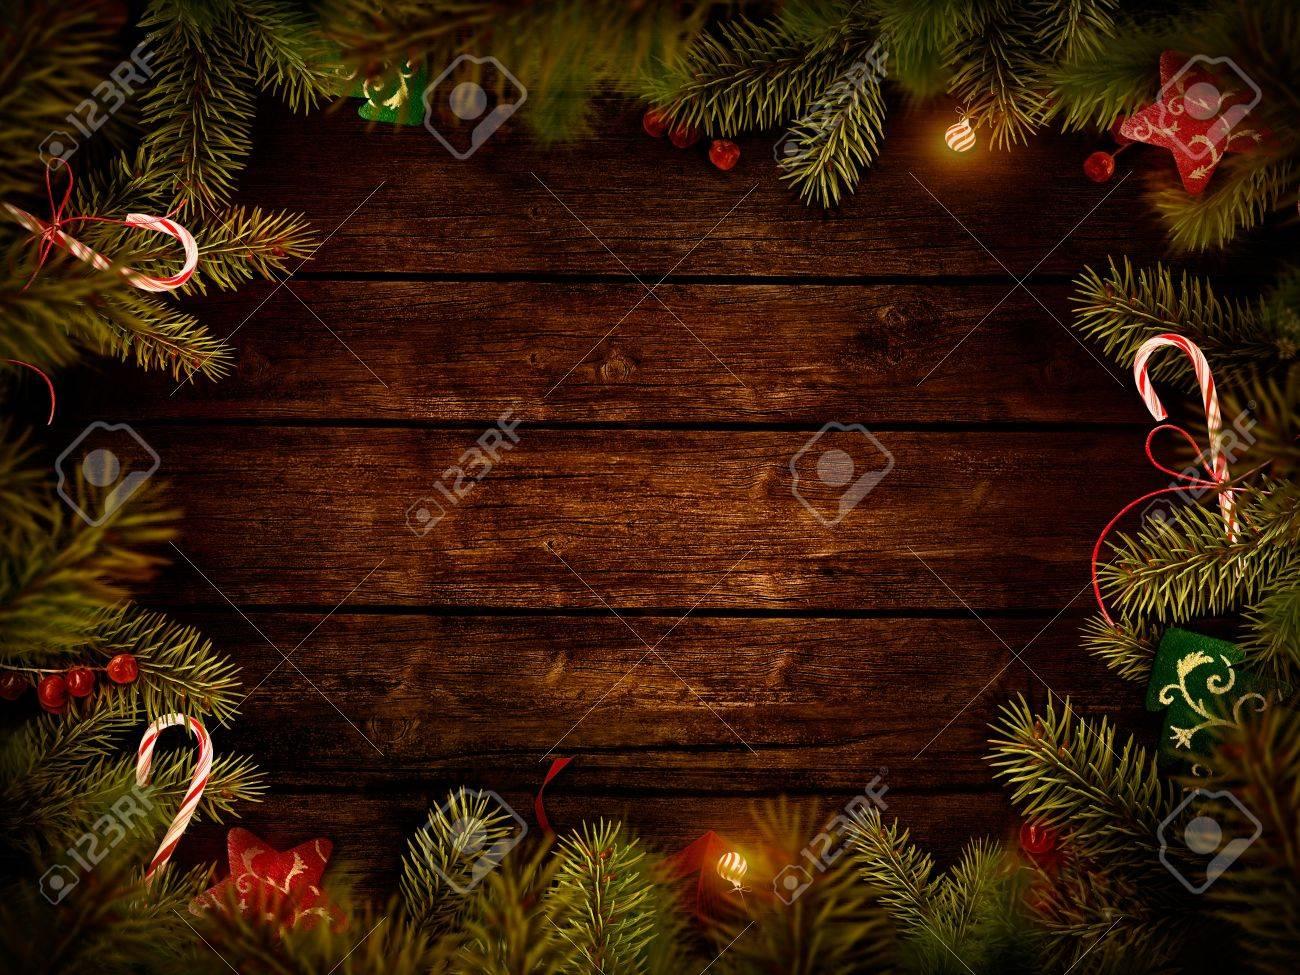 Christmas Design - Merry Christmas. Xmas Border Card With With ...